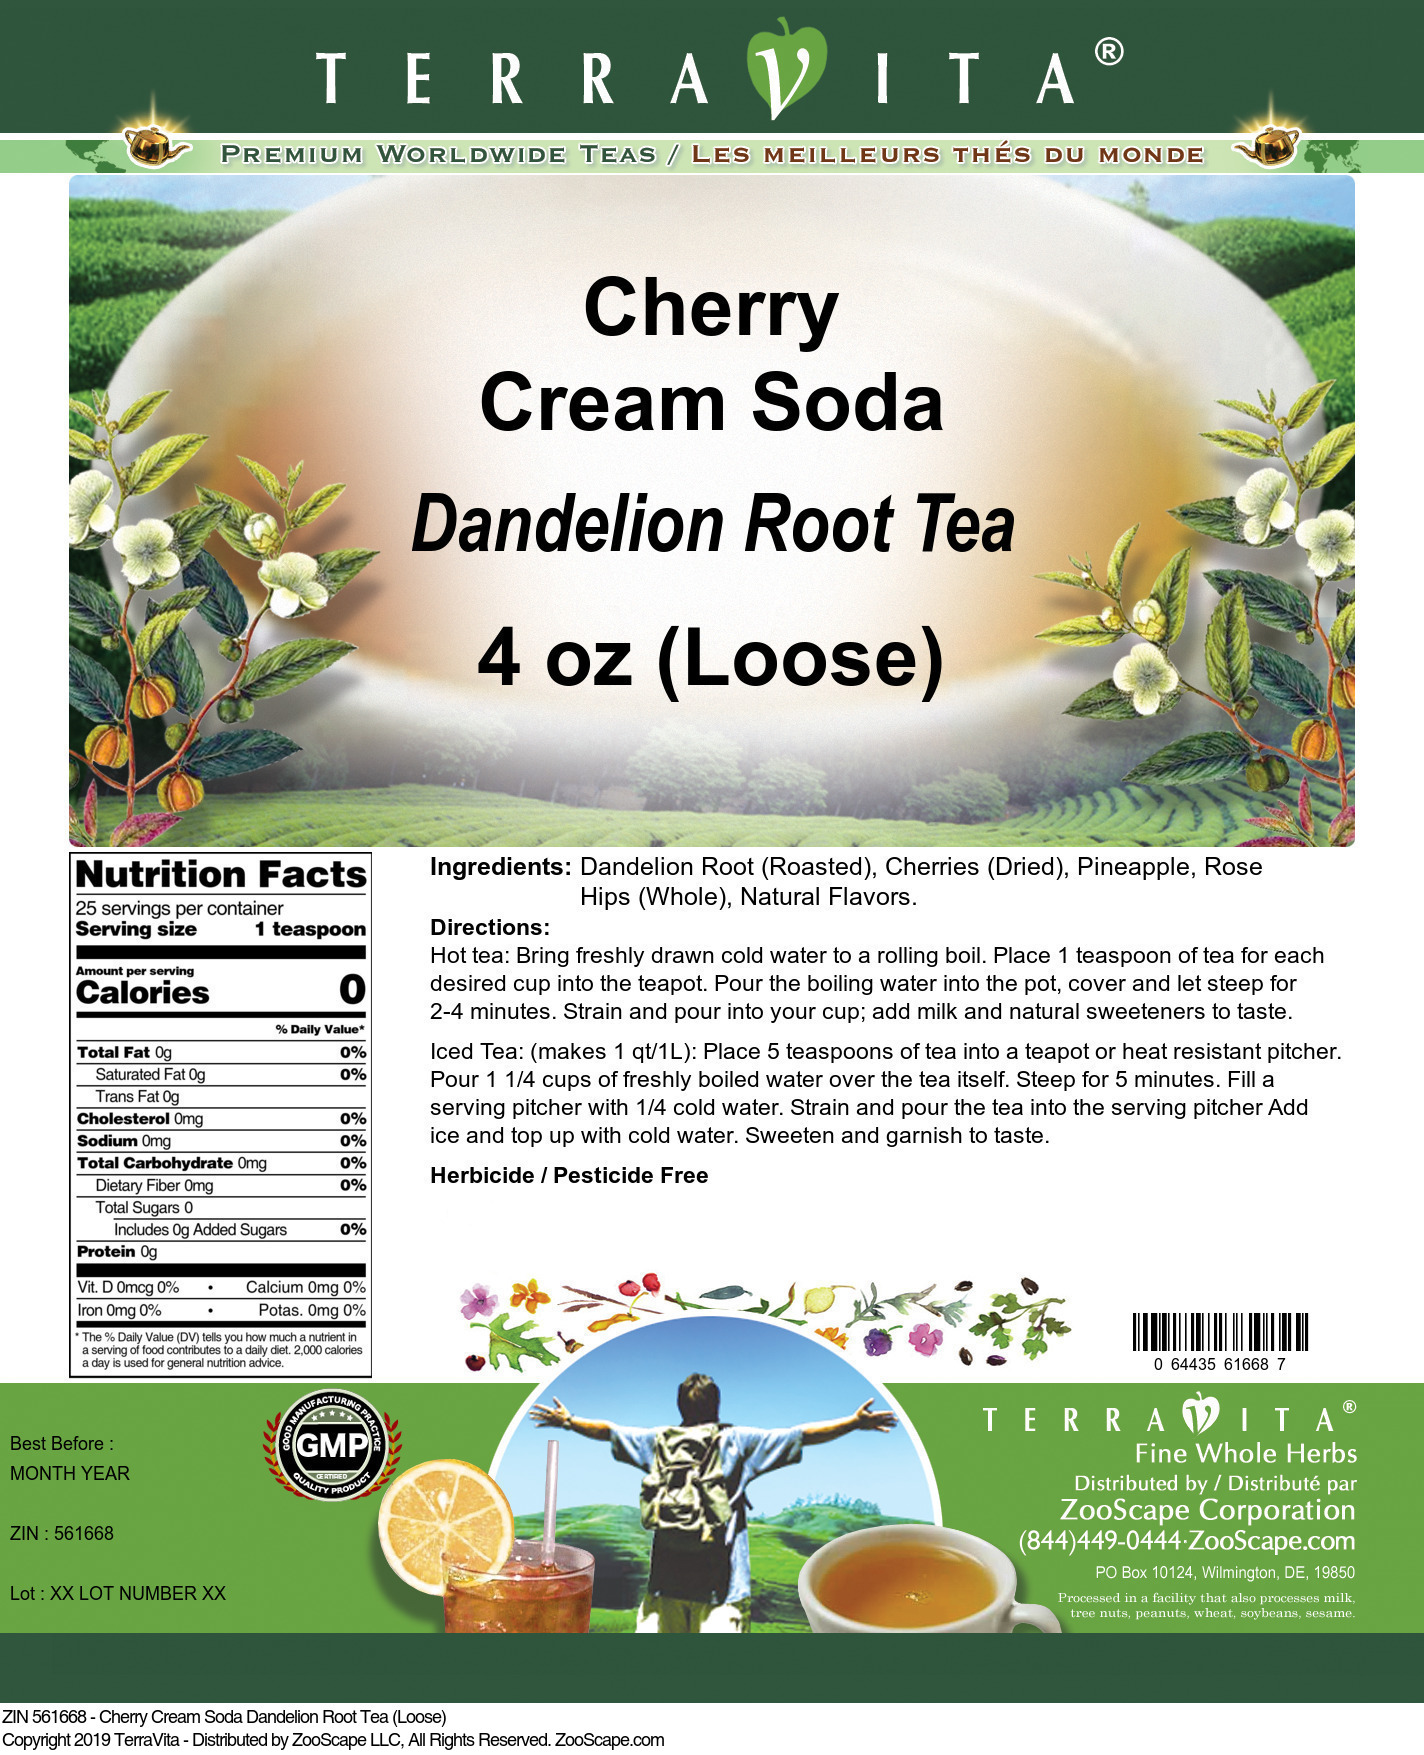 Cherry Cream Soda Dandelion Root